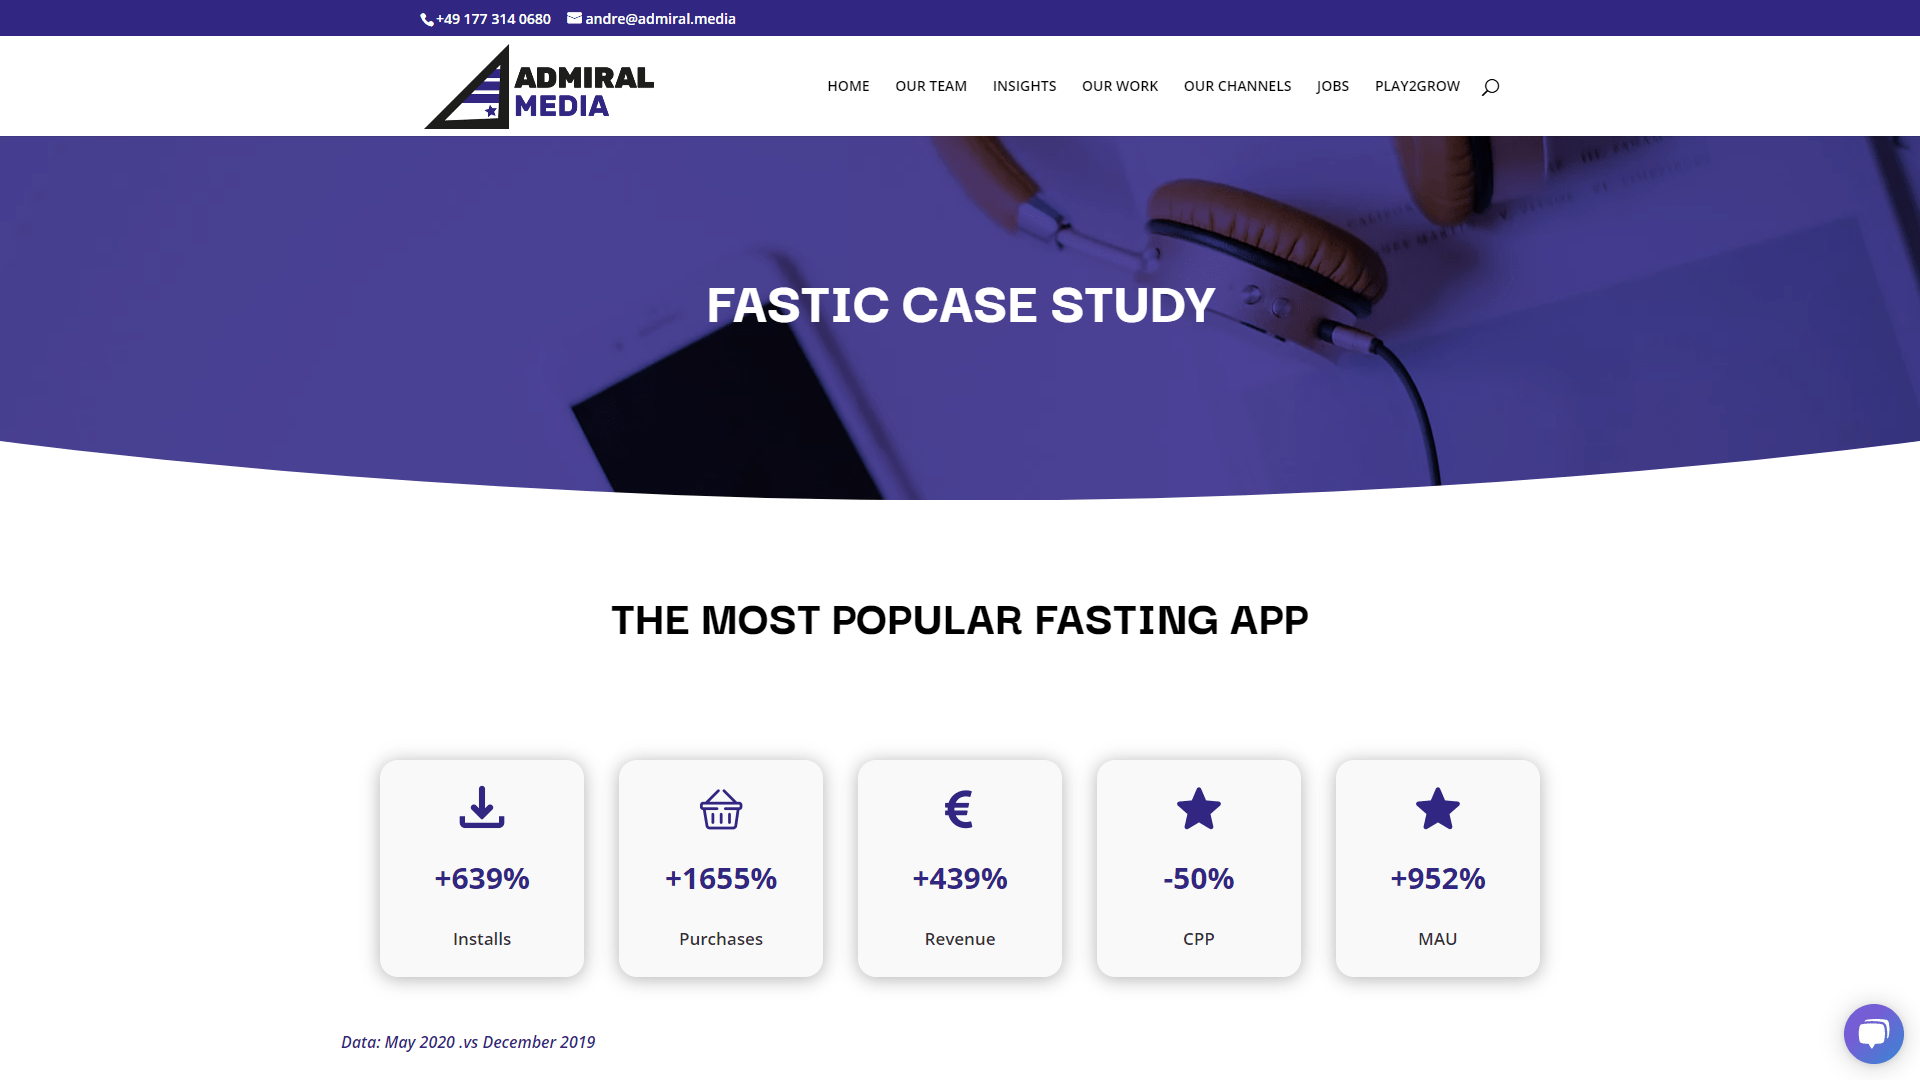 Fastic Case Study – Admiral Media